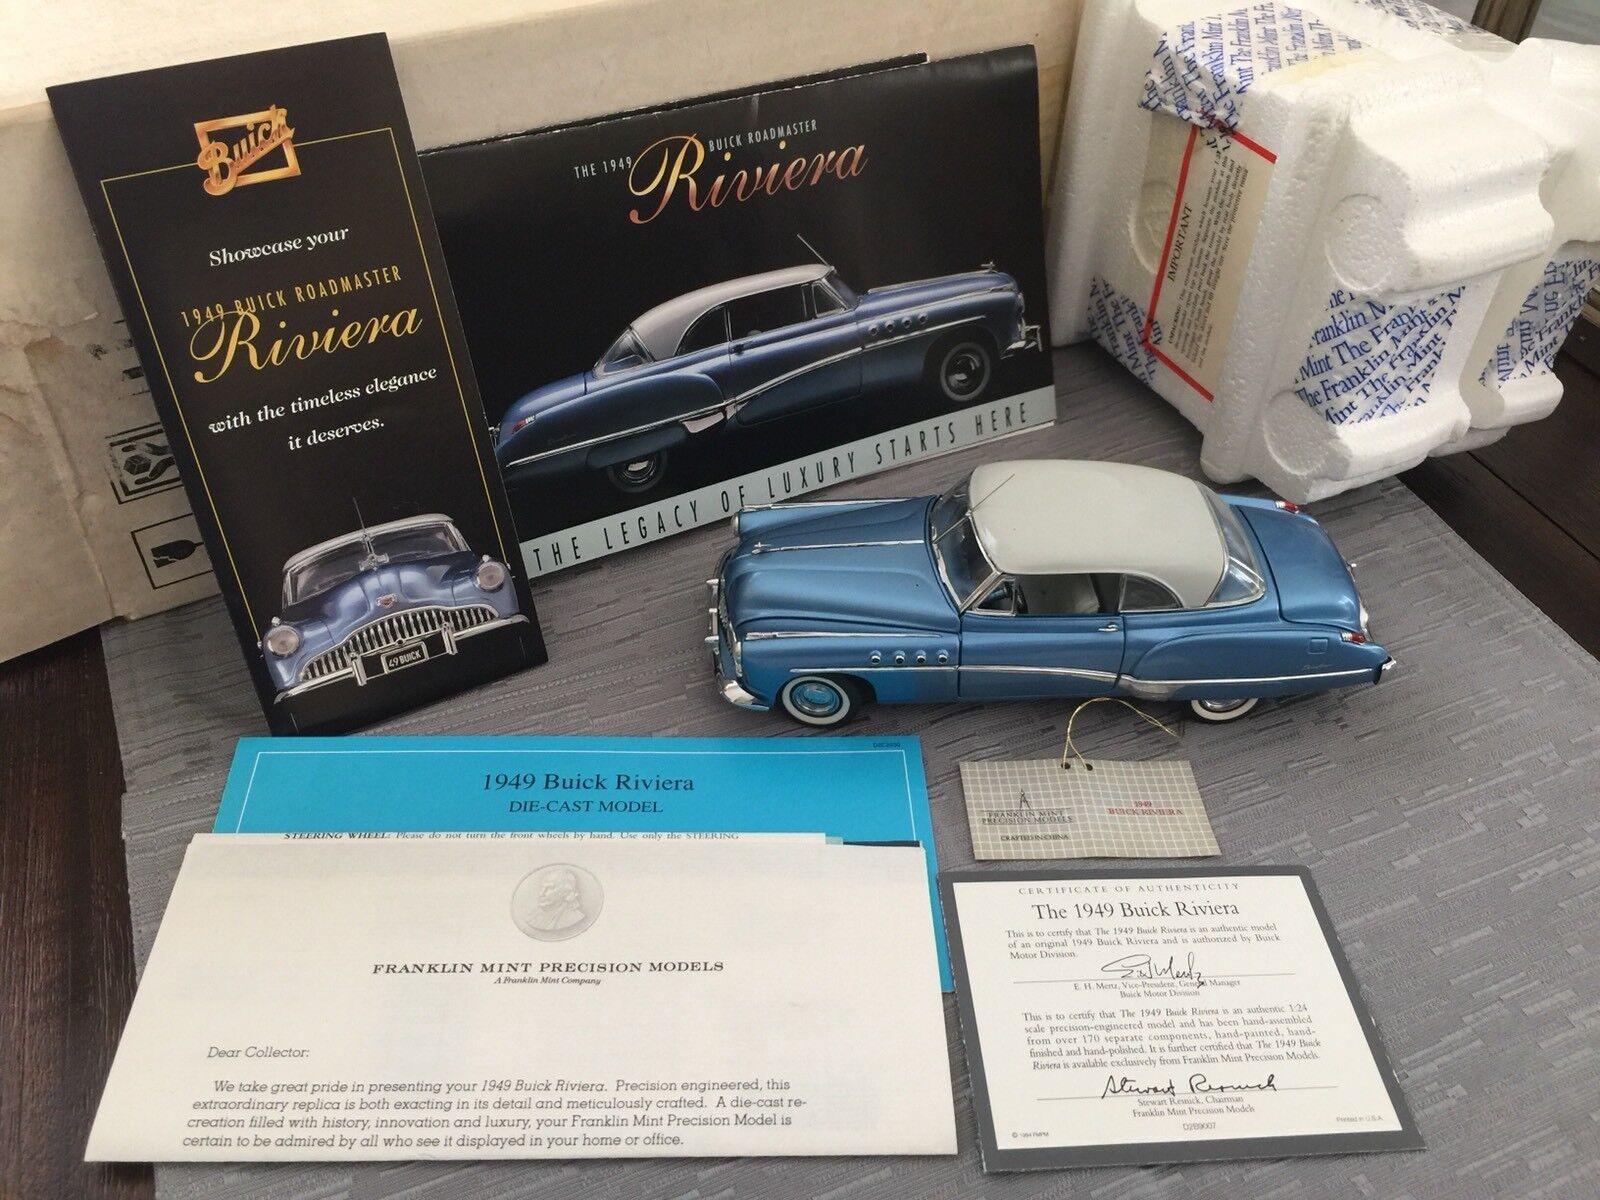 FRANKLIN MINT 1949 BUICK RIVIERA Hard TOP METALLISK blå 1 24 DIESAT W COA OCH låda